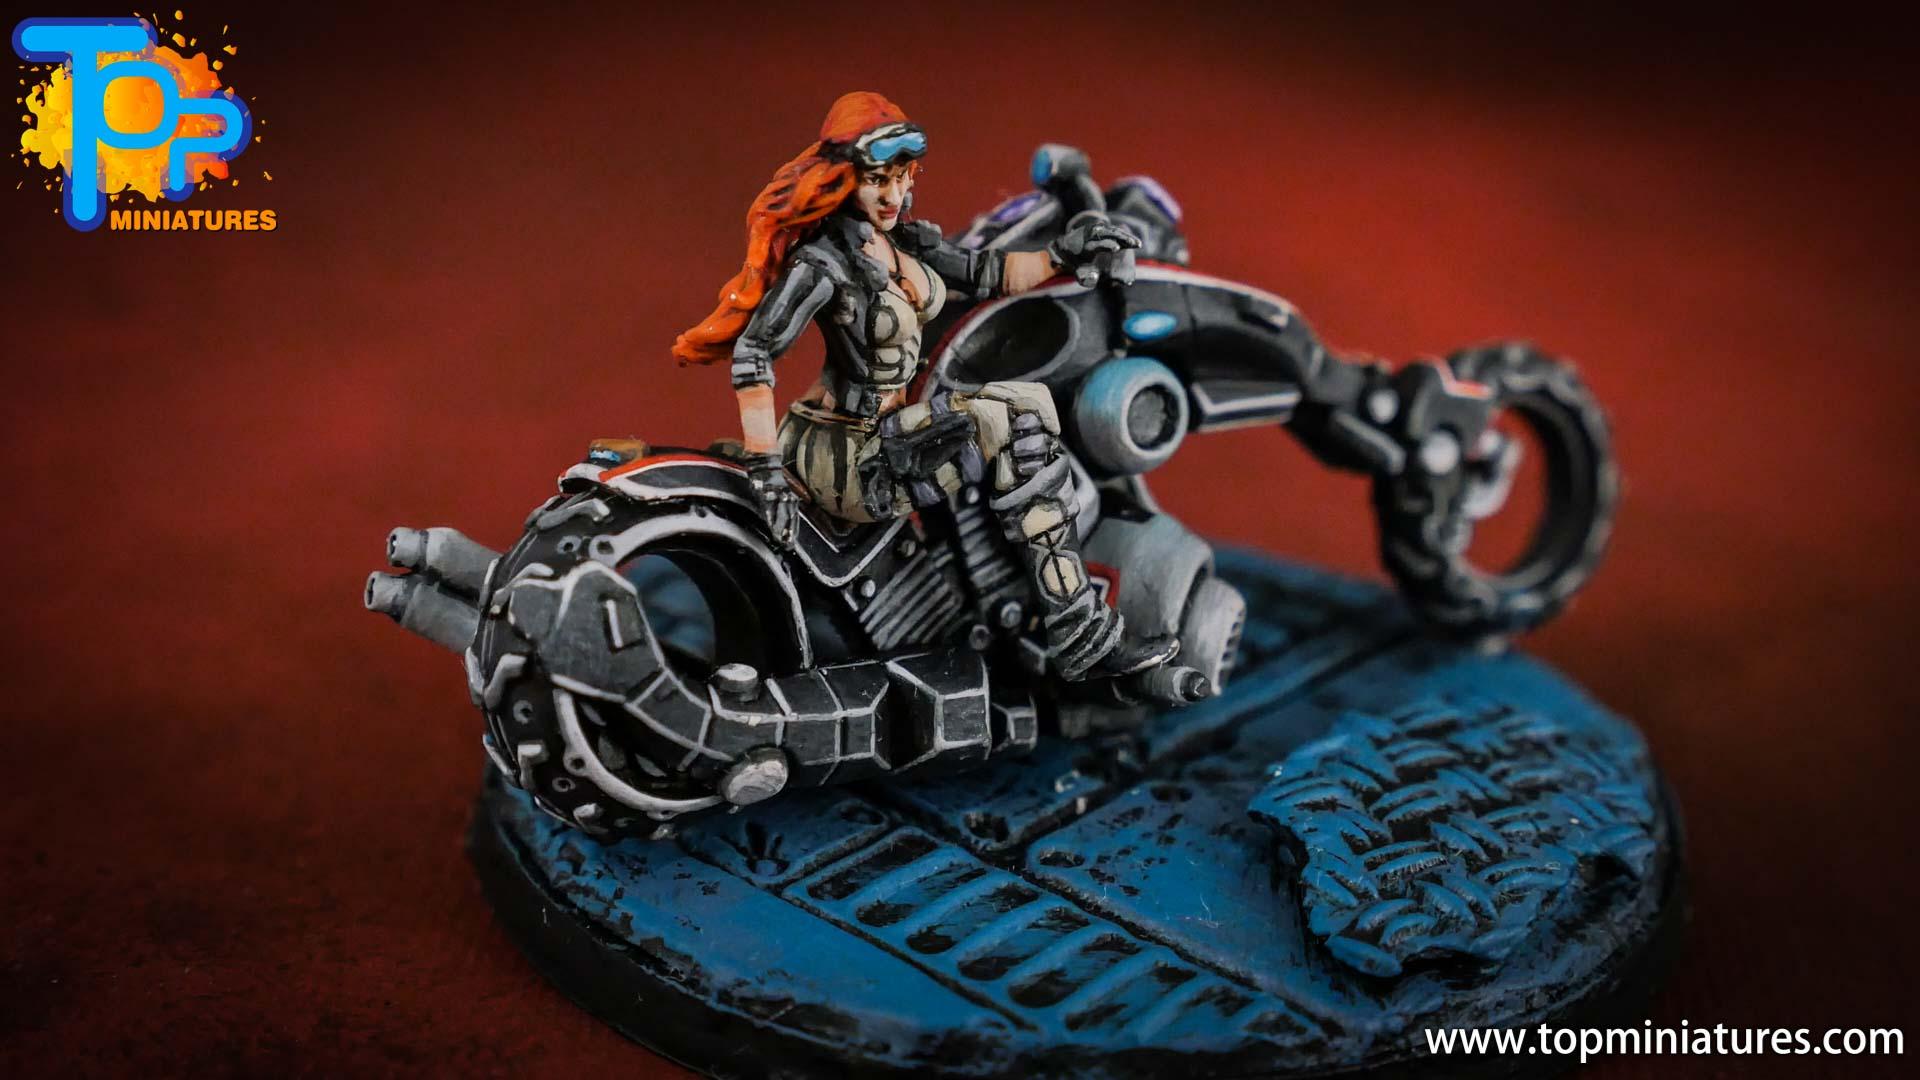 infinity nomads penthesilea amazon biker (3)